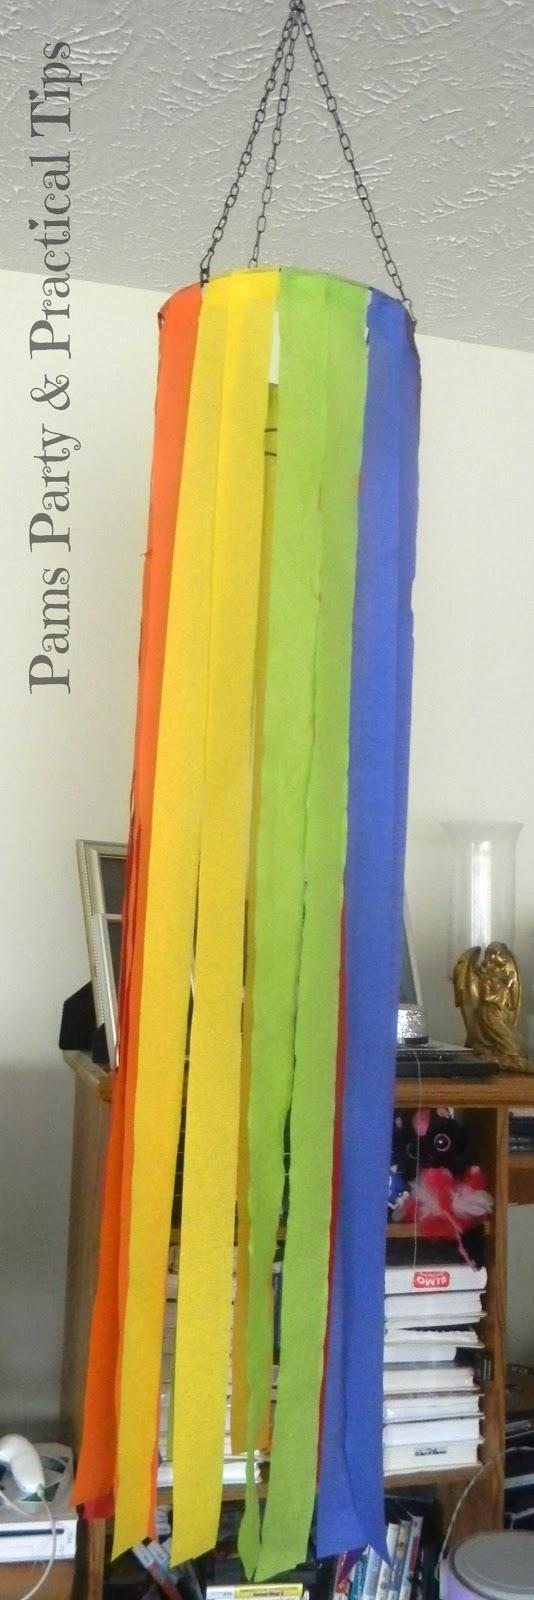 Rainbow Party Crepe Paper Chandelier